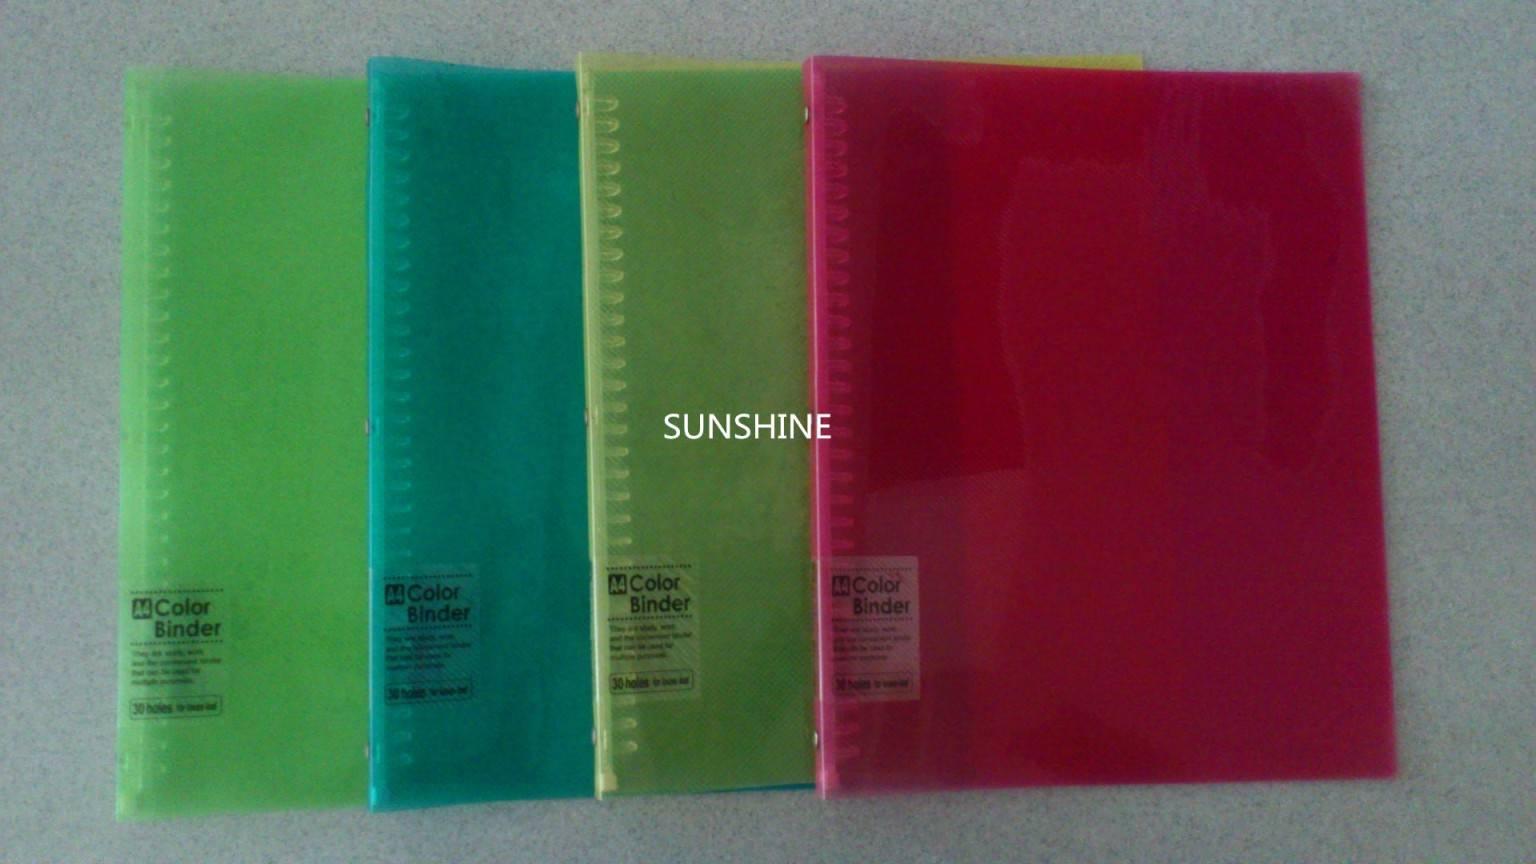 PP stationery file folder